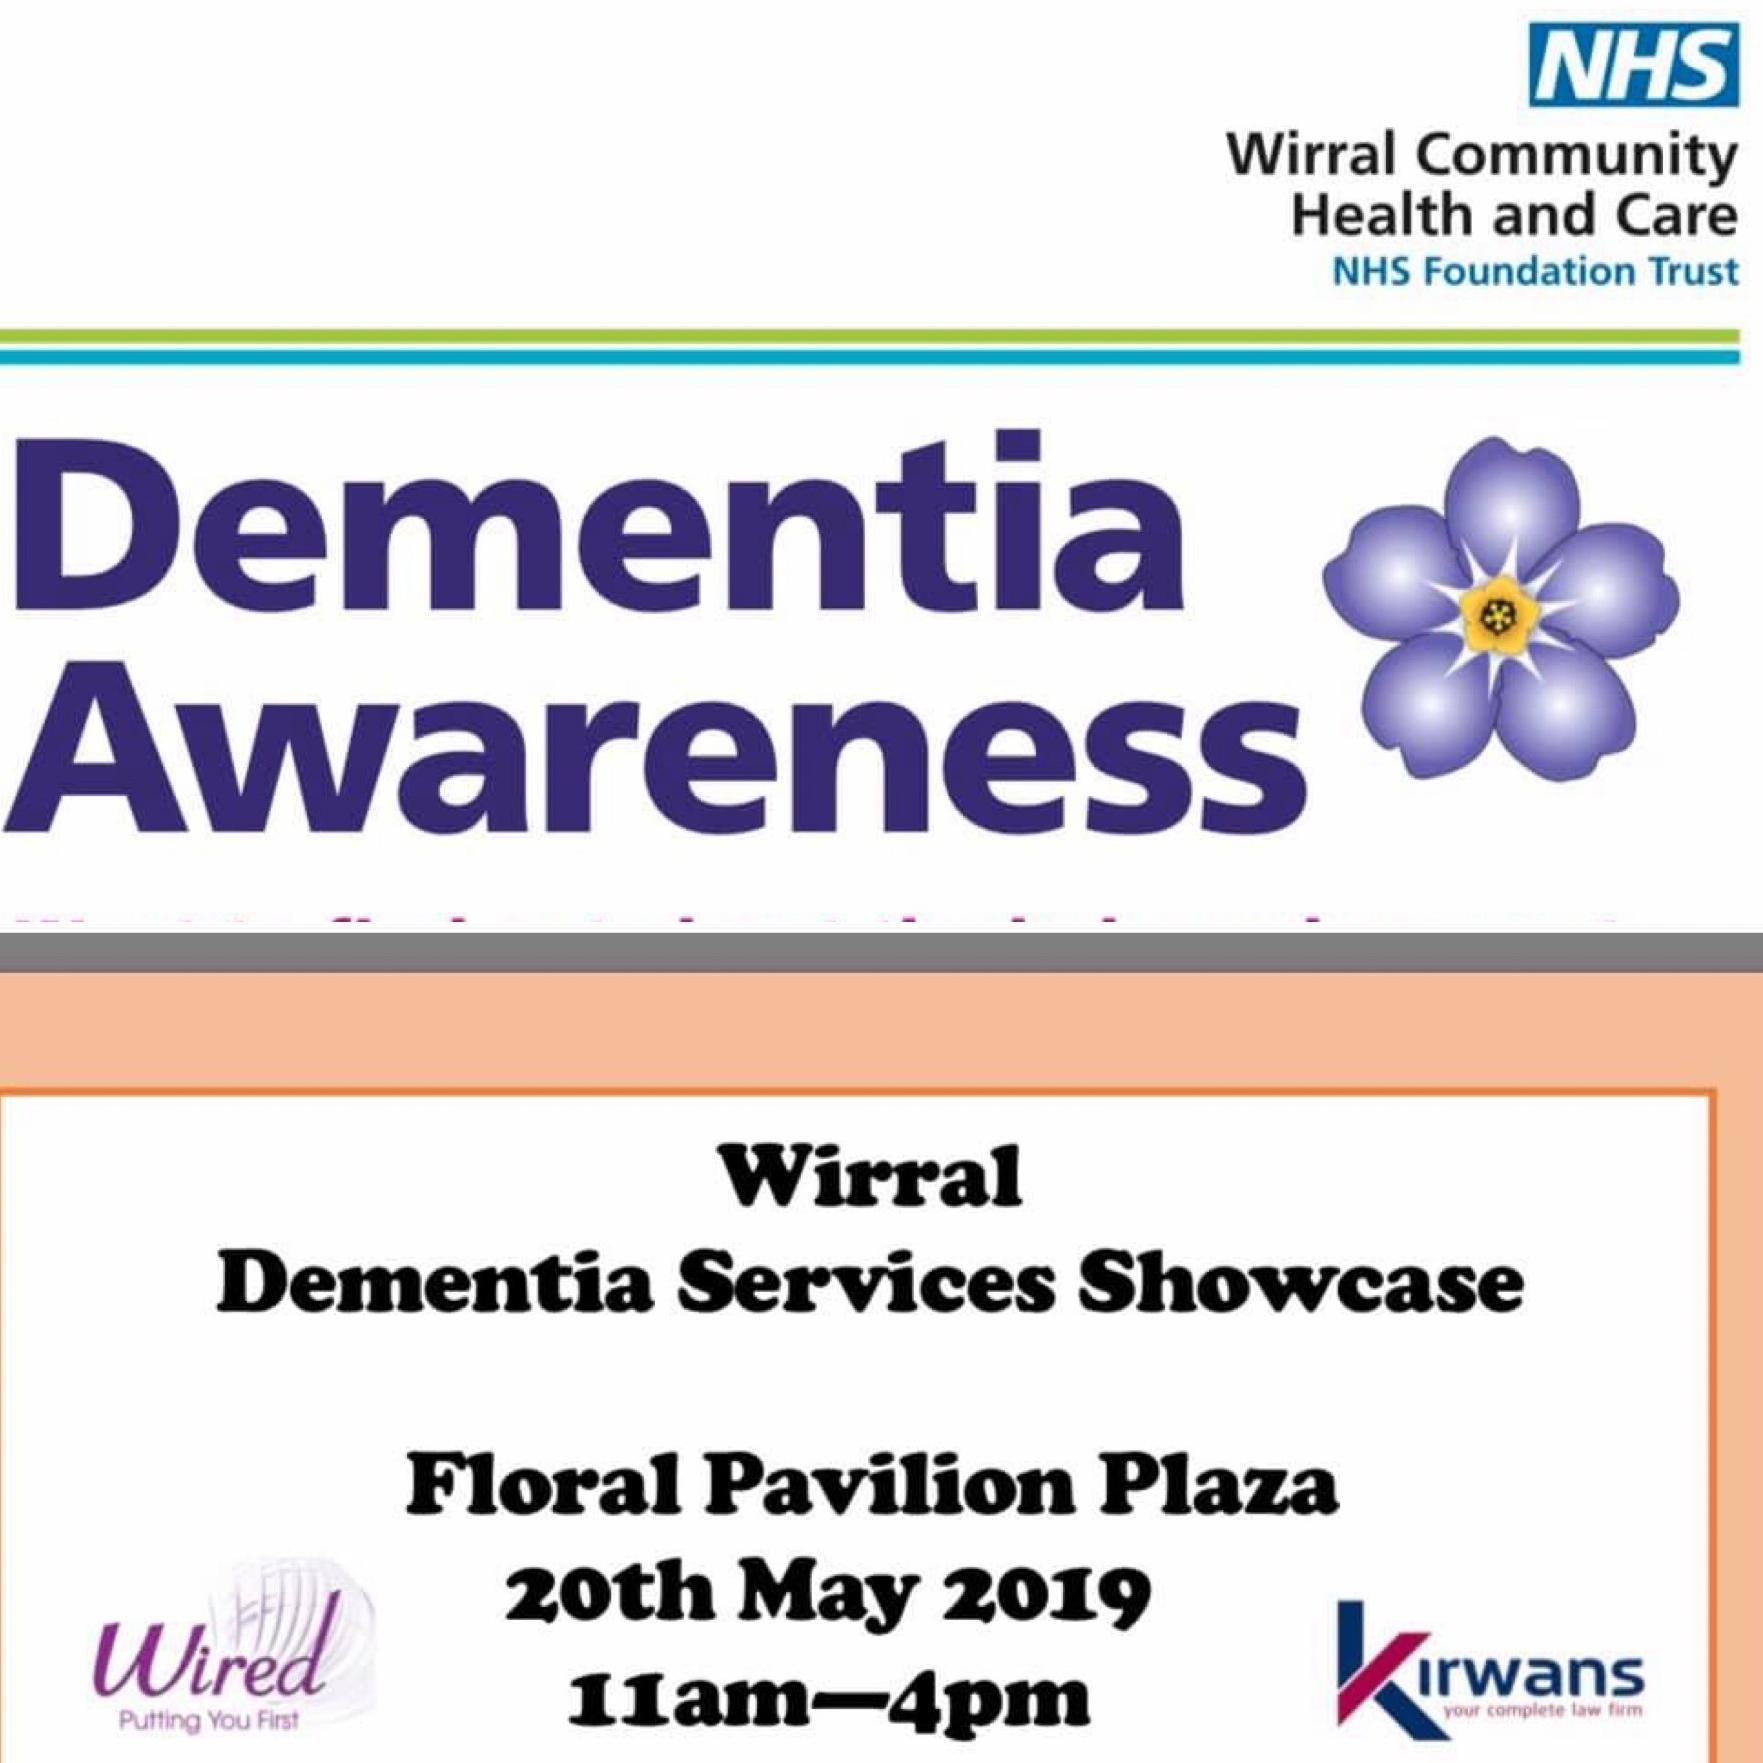 Wirral Dementia Services Showcase